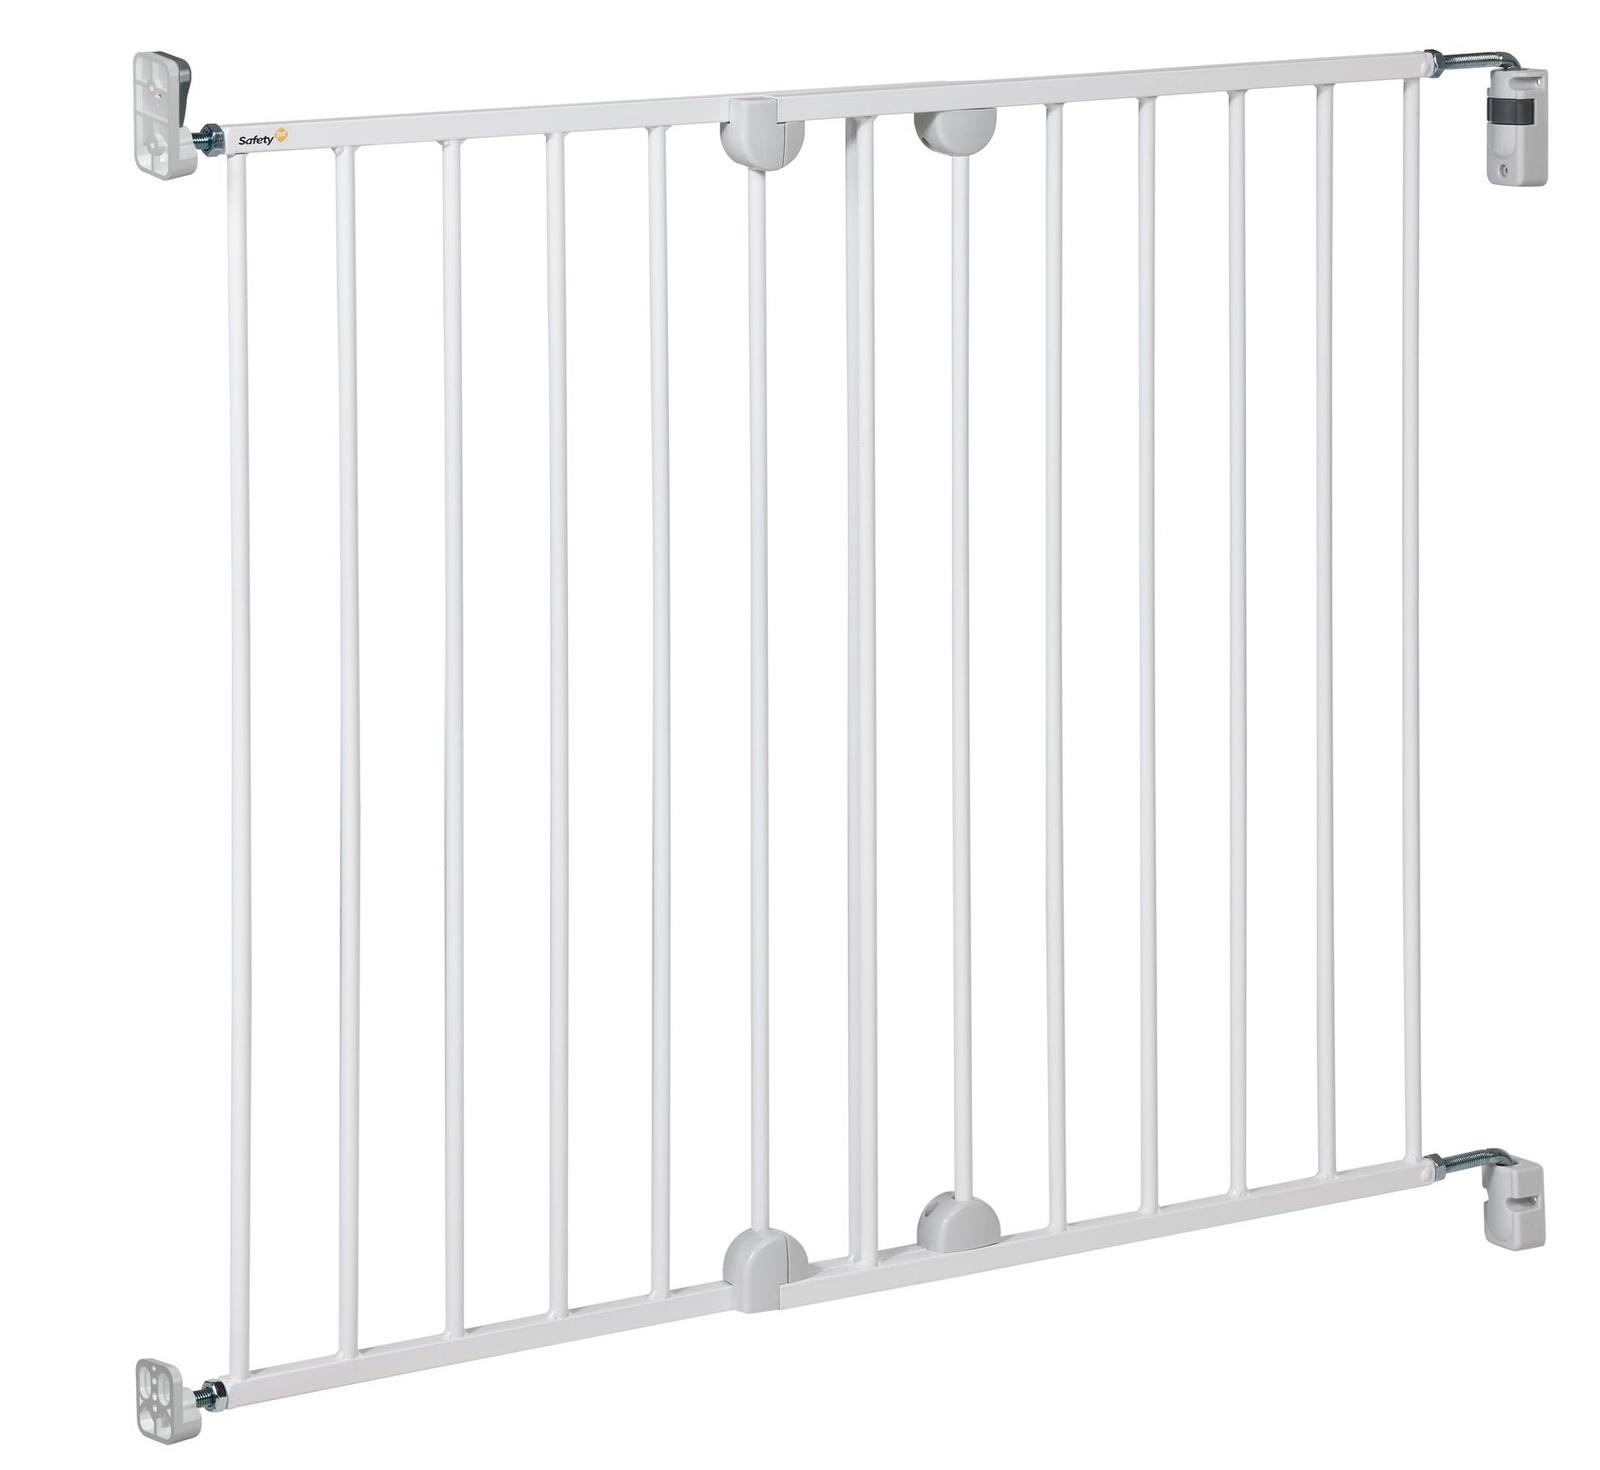 Ворота безопасности Safety 1st Ворота безопасности Safety 1st WALL-FIX EXTENDING METAL, 2438431000, 2438431000 белый барьер safety 1st барьер safety 1st 24530010 24530010 серый